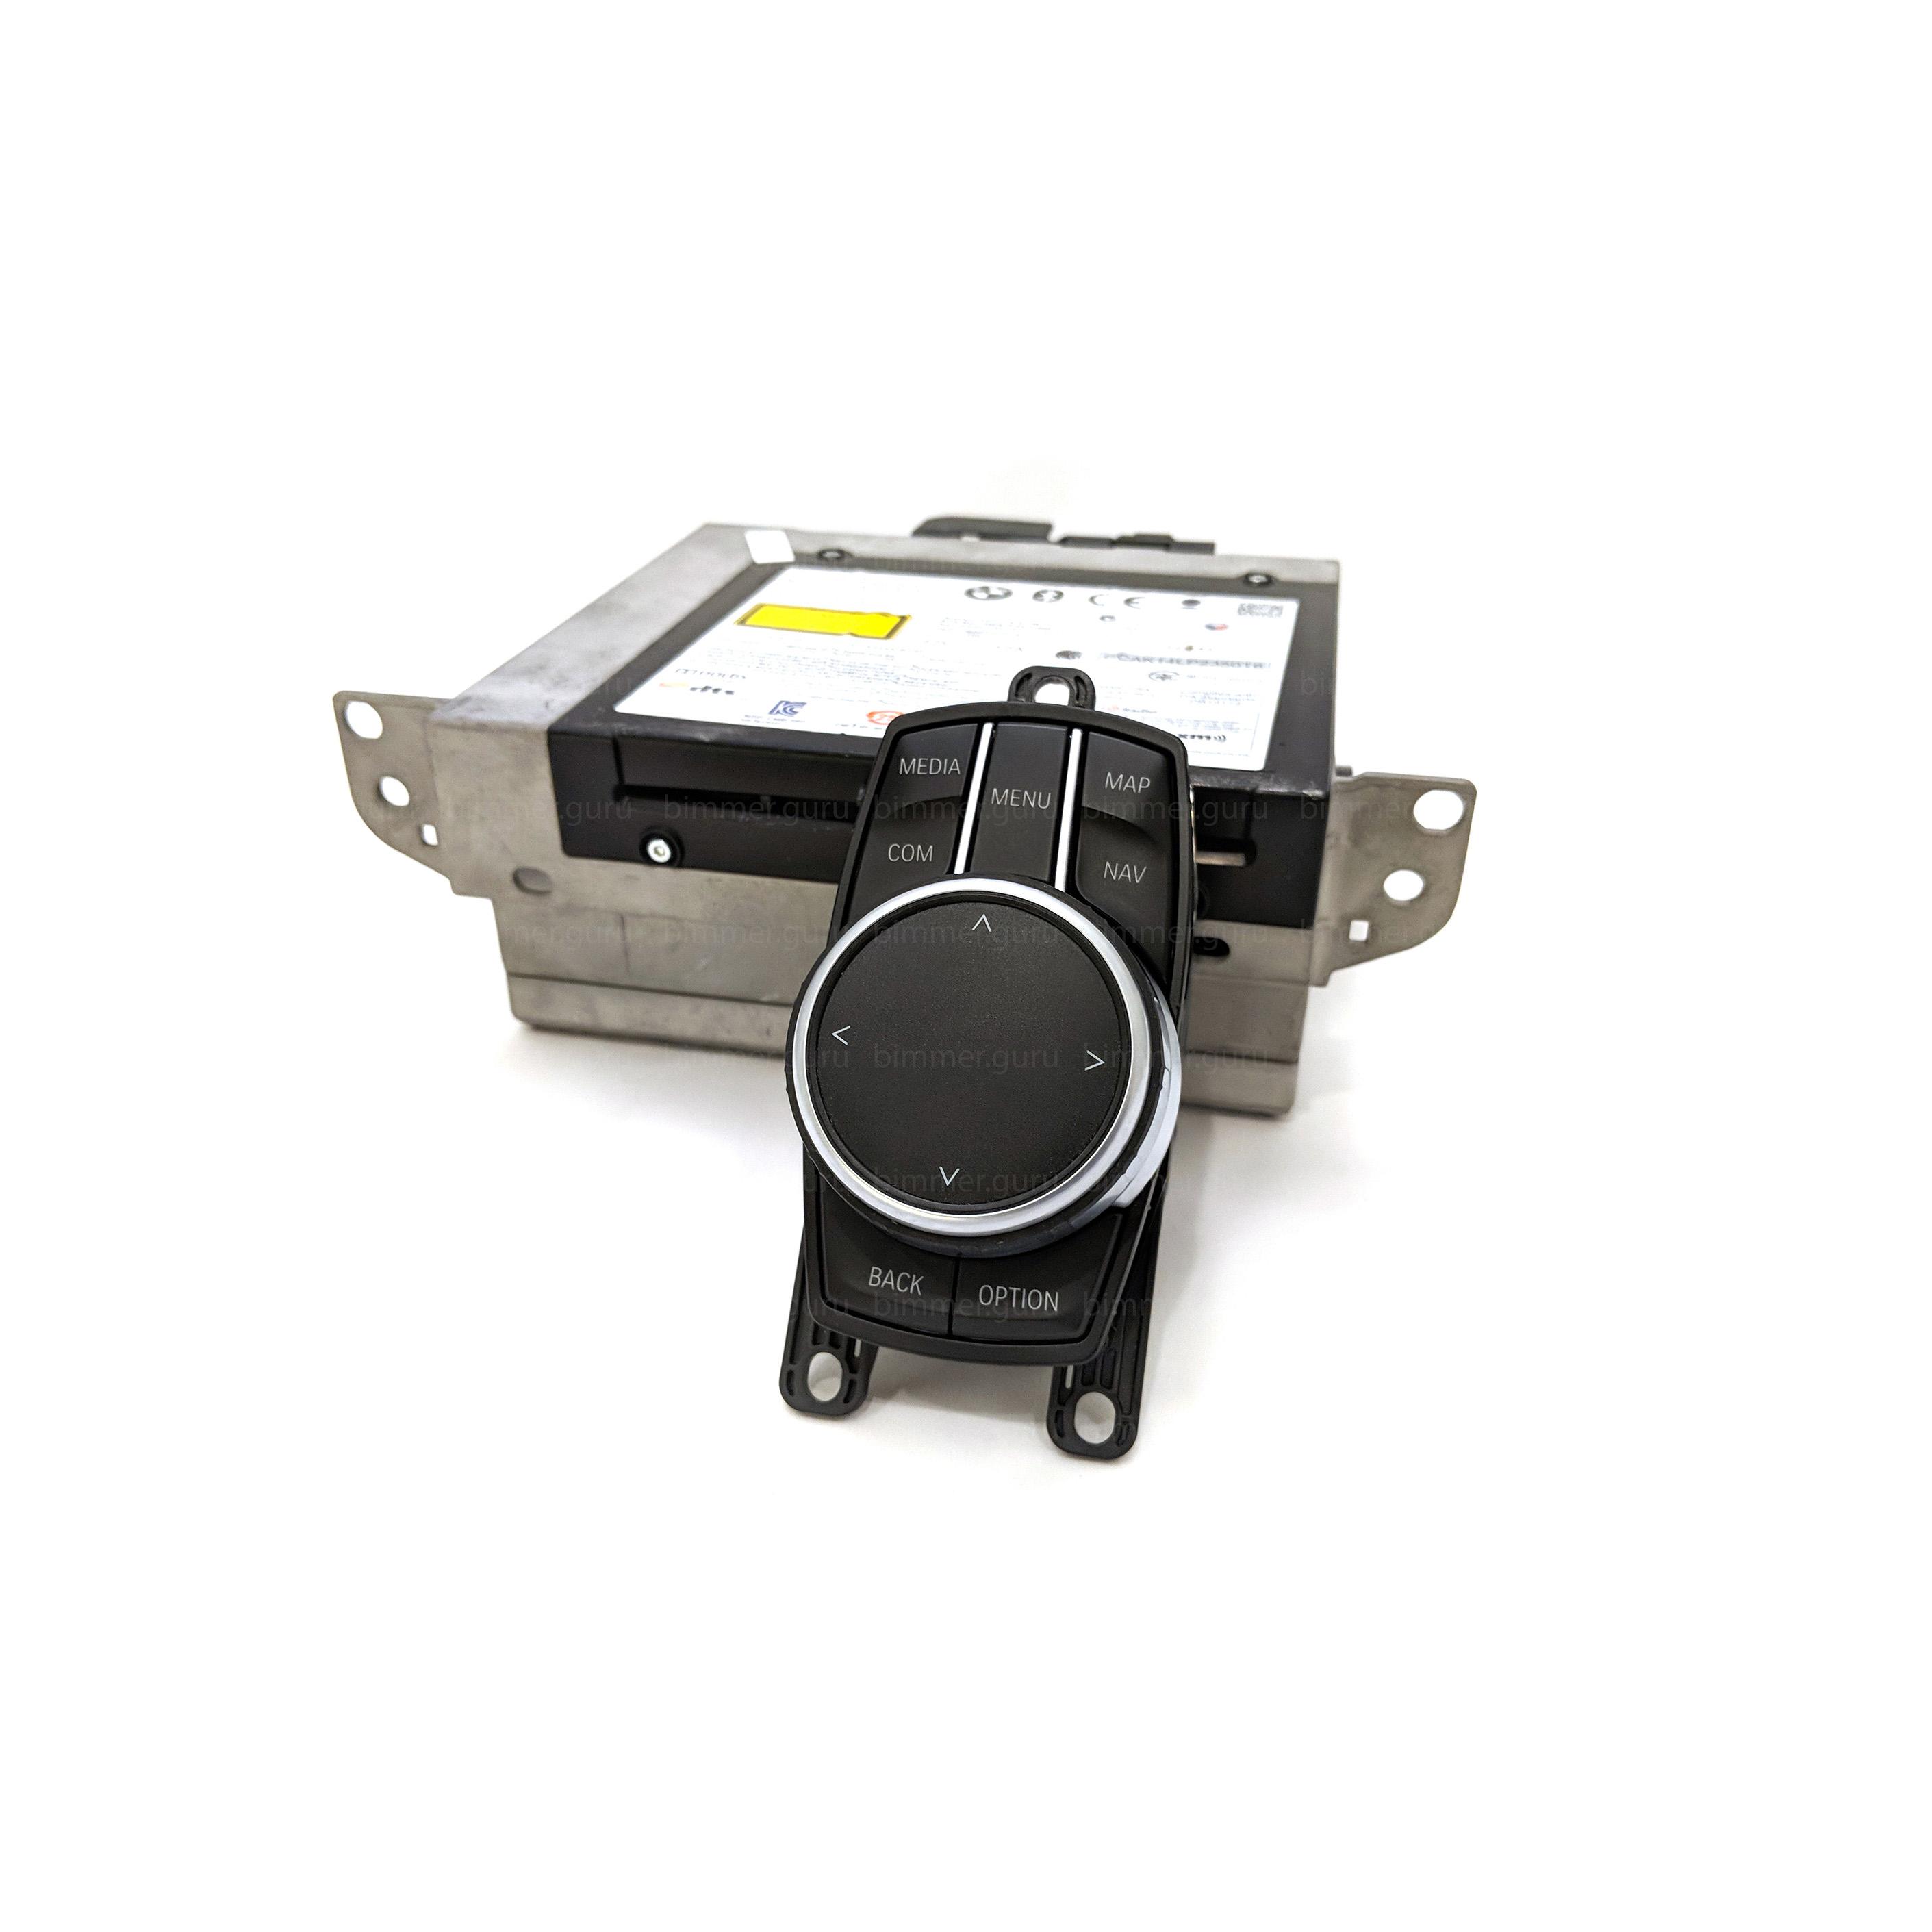 BMW EVO Professional Navigation + touch iDrive (5 series, G30)